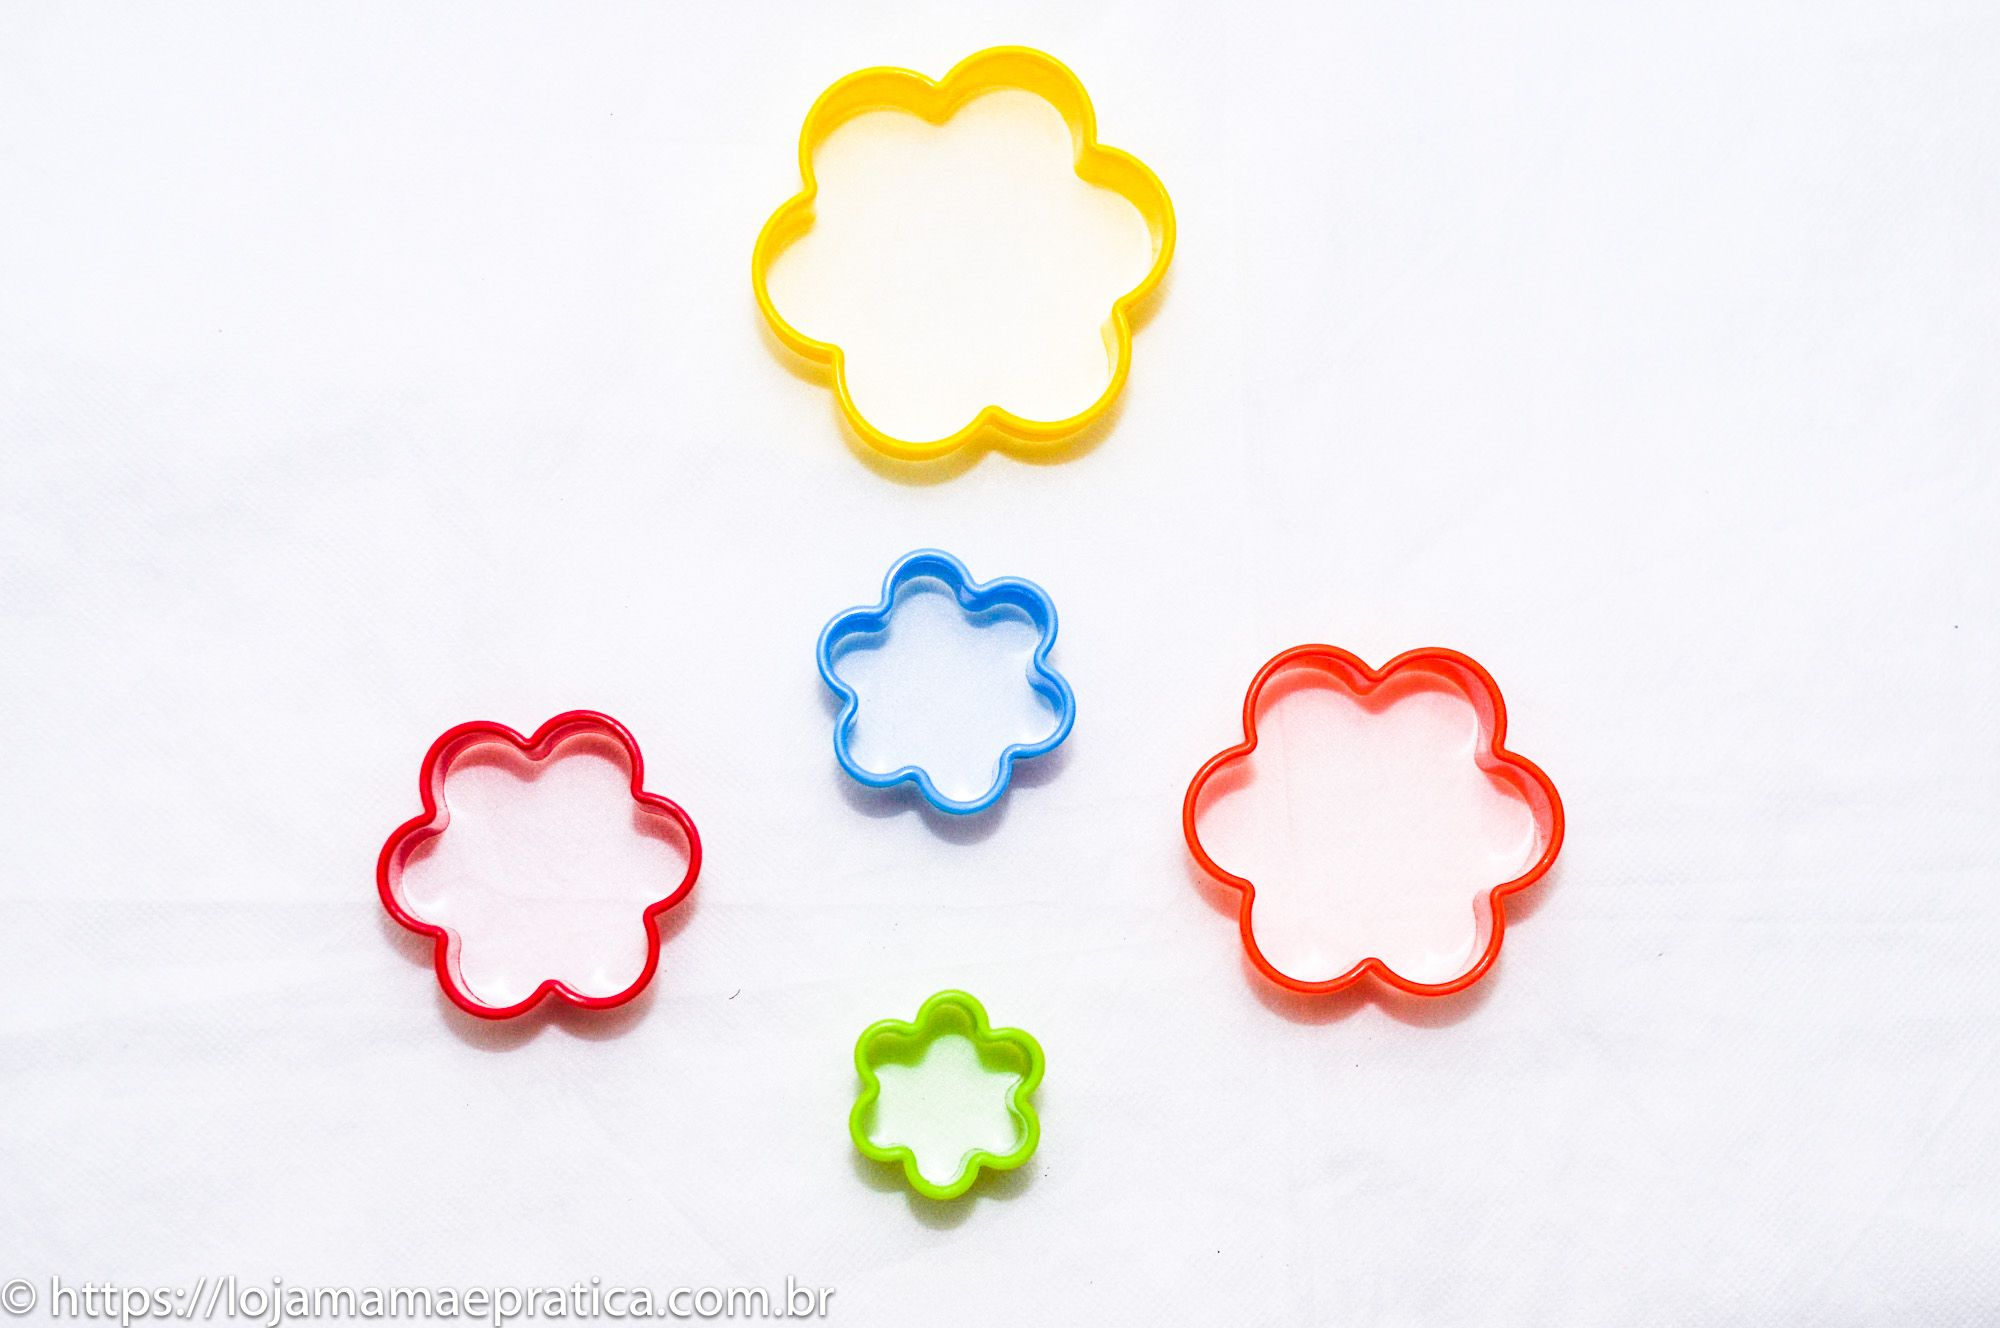 Conjunto de cortadores coloridos - 5 peças